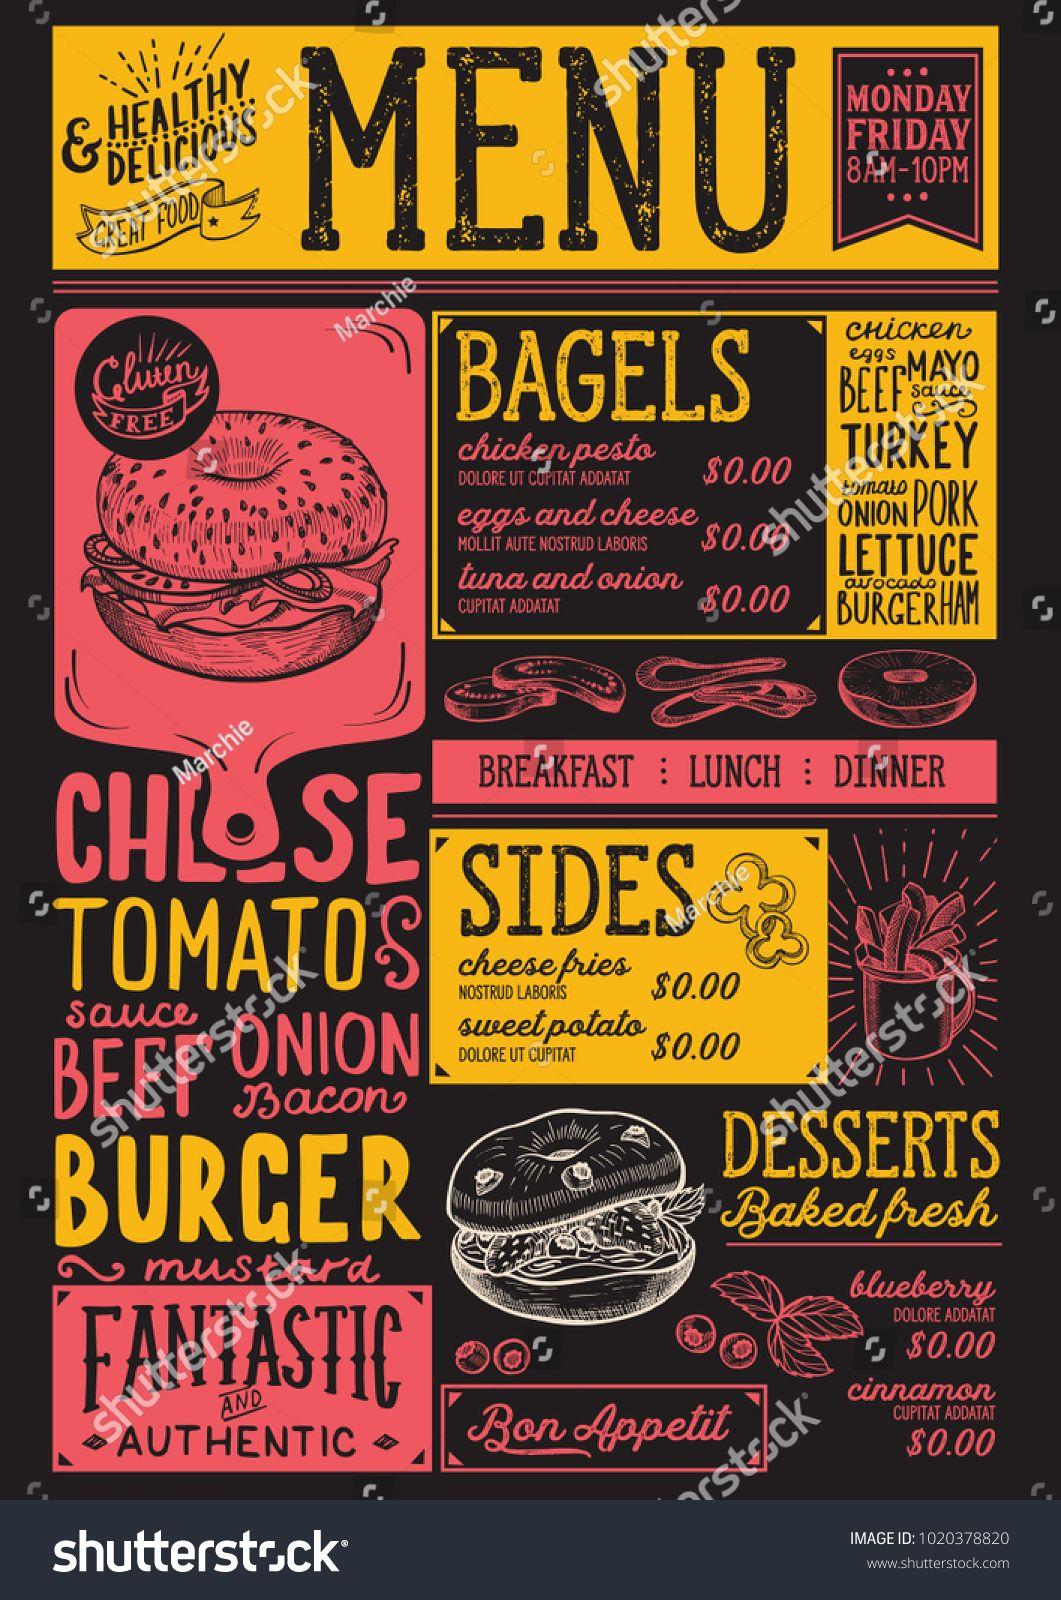 Bagels Restaurant Menu Vector Sandwich Food Flyer For Bar And Cafe Design Template With Vintage Hand Dra In 2020 Menu Restaurant Bbq Menu Design Catering Menu Design